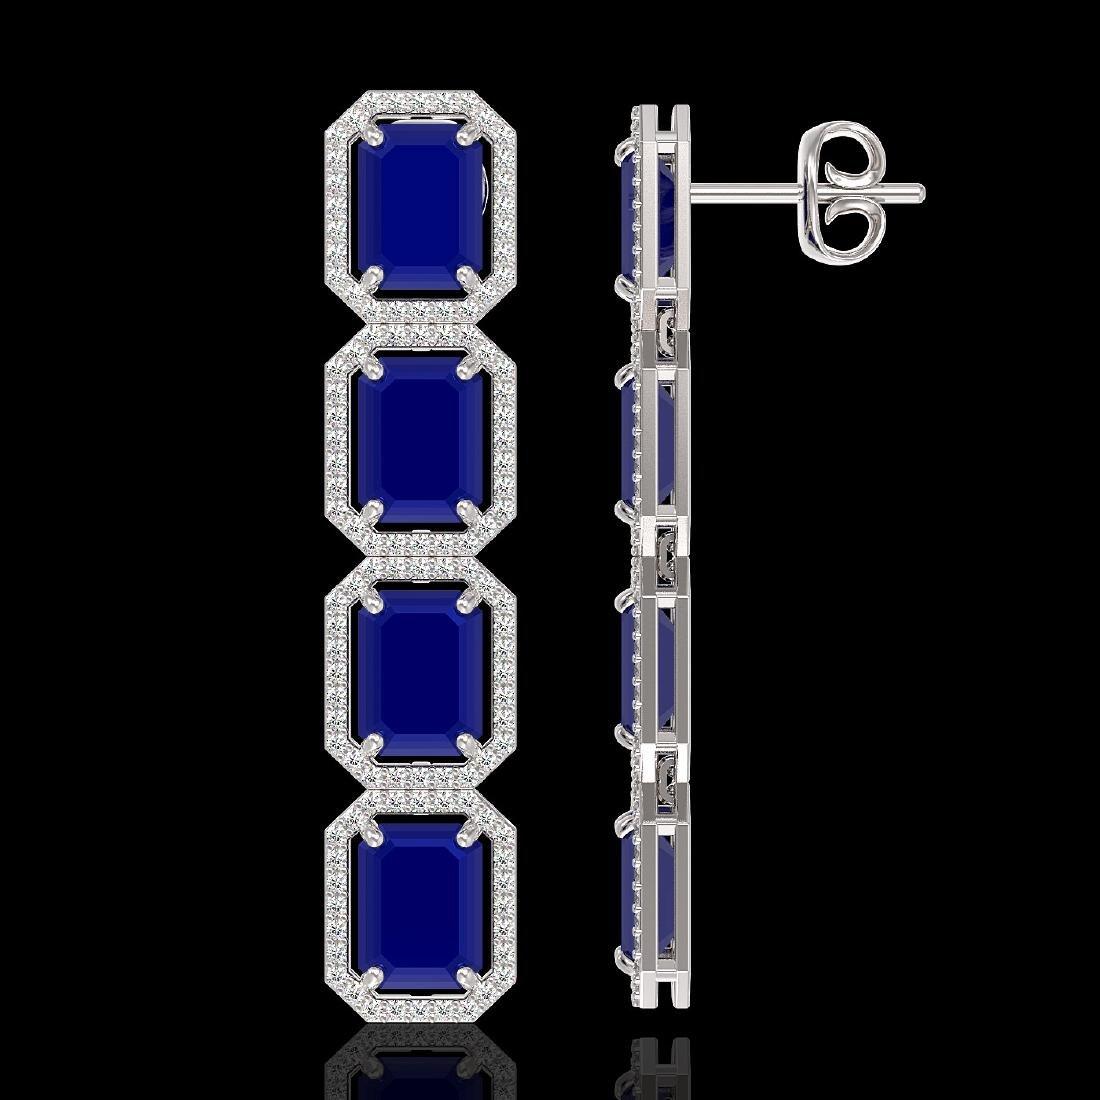 20.59 CTW Sapphire & Diamond Halo Earrings 10K White - 2